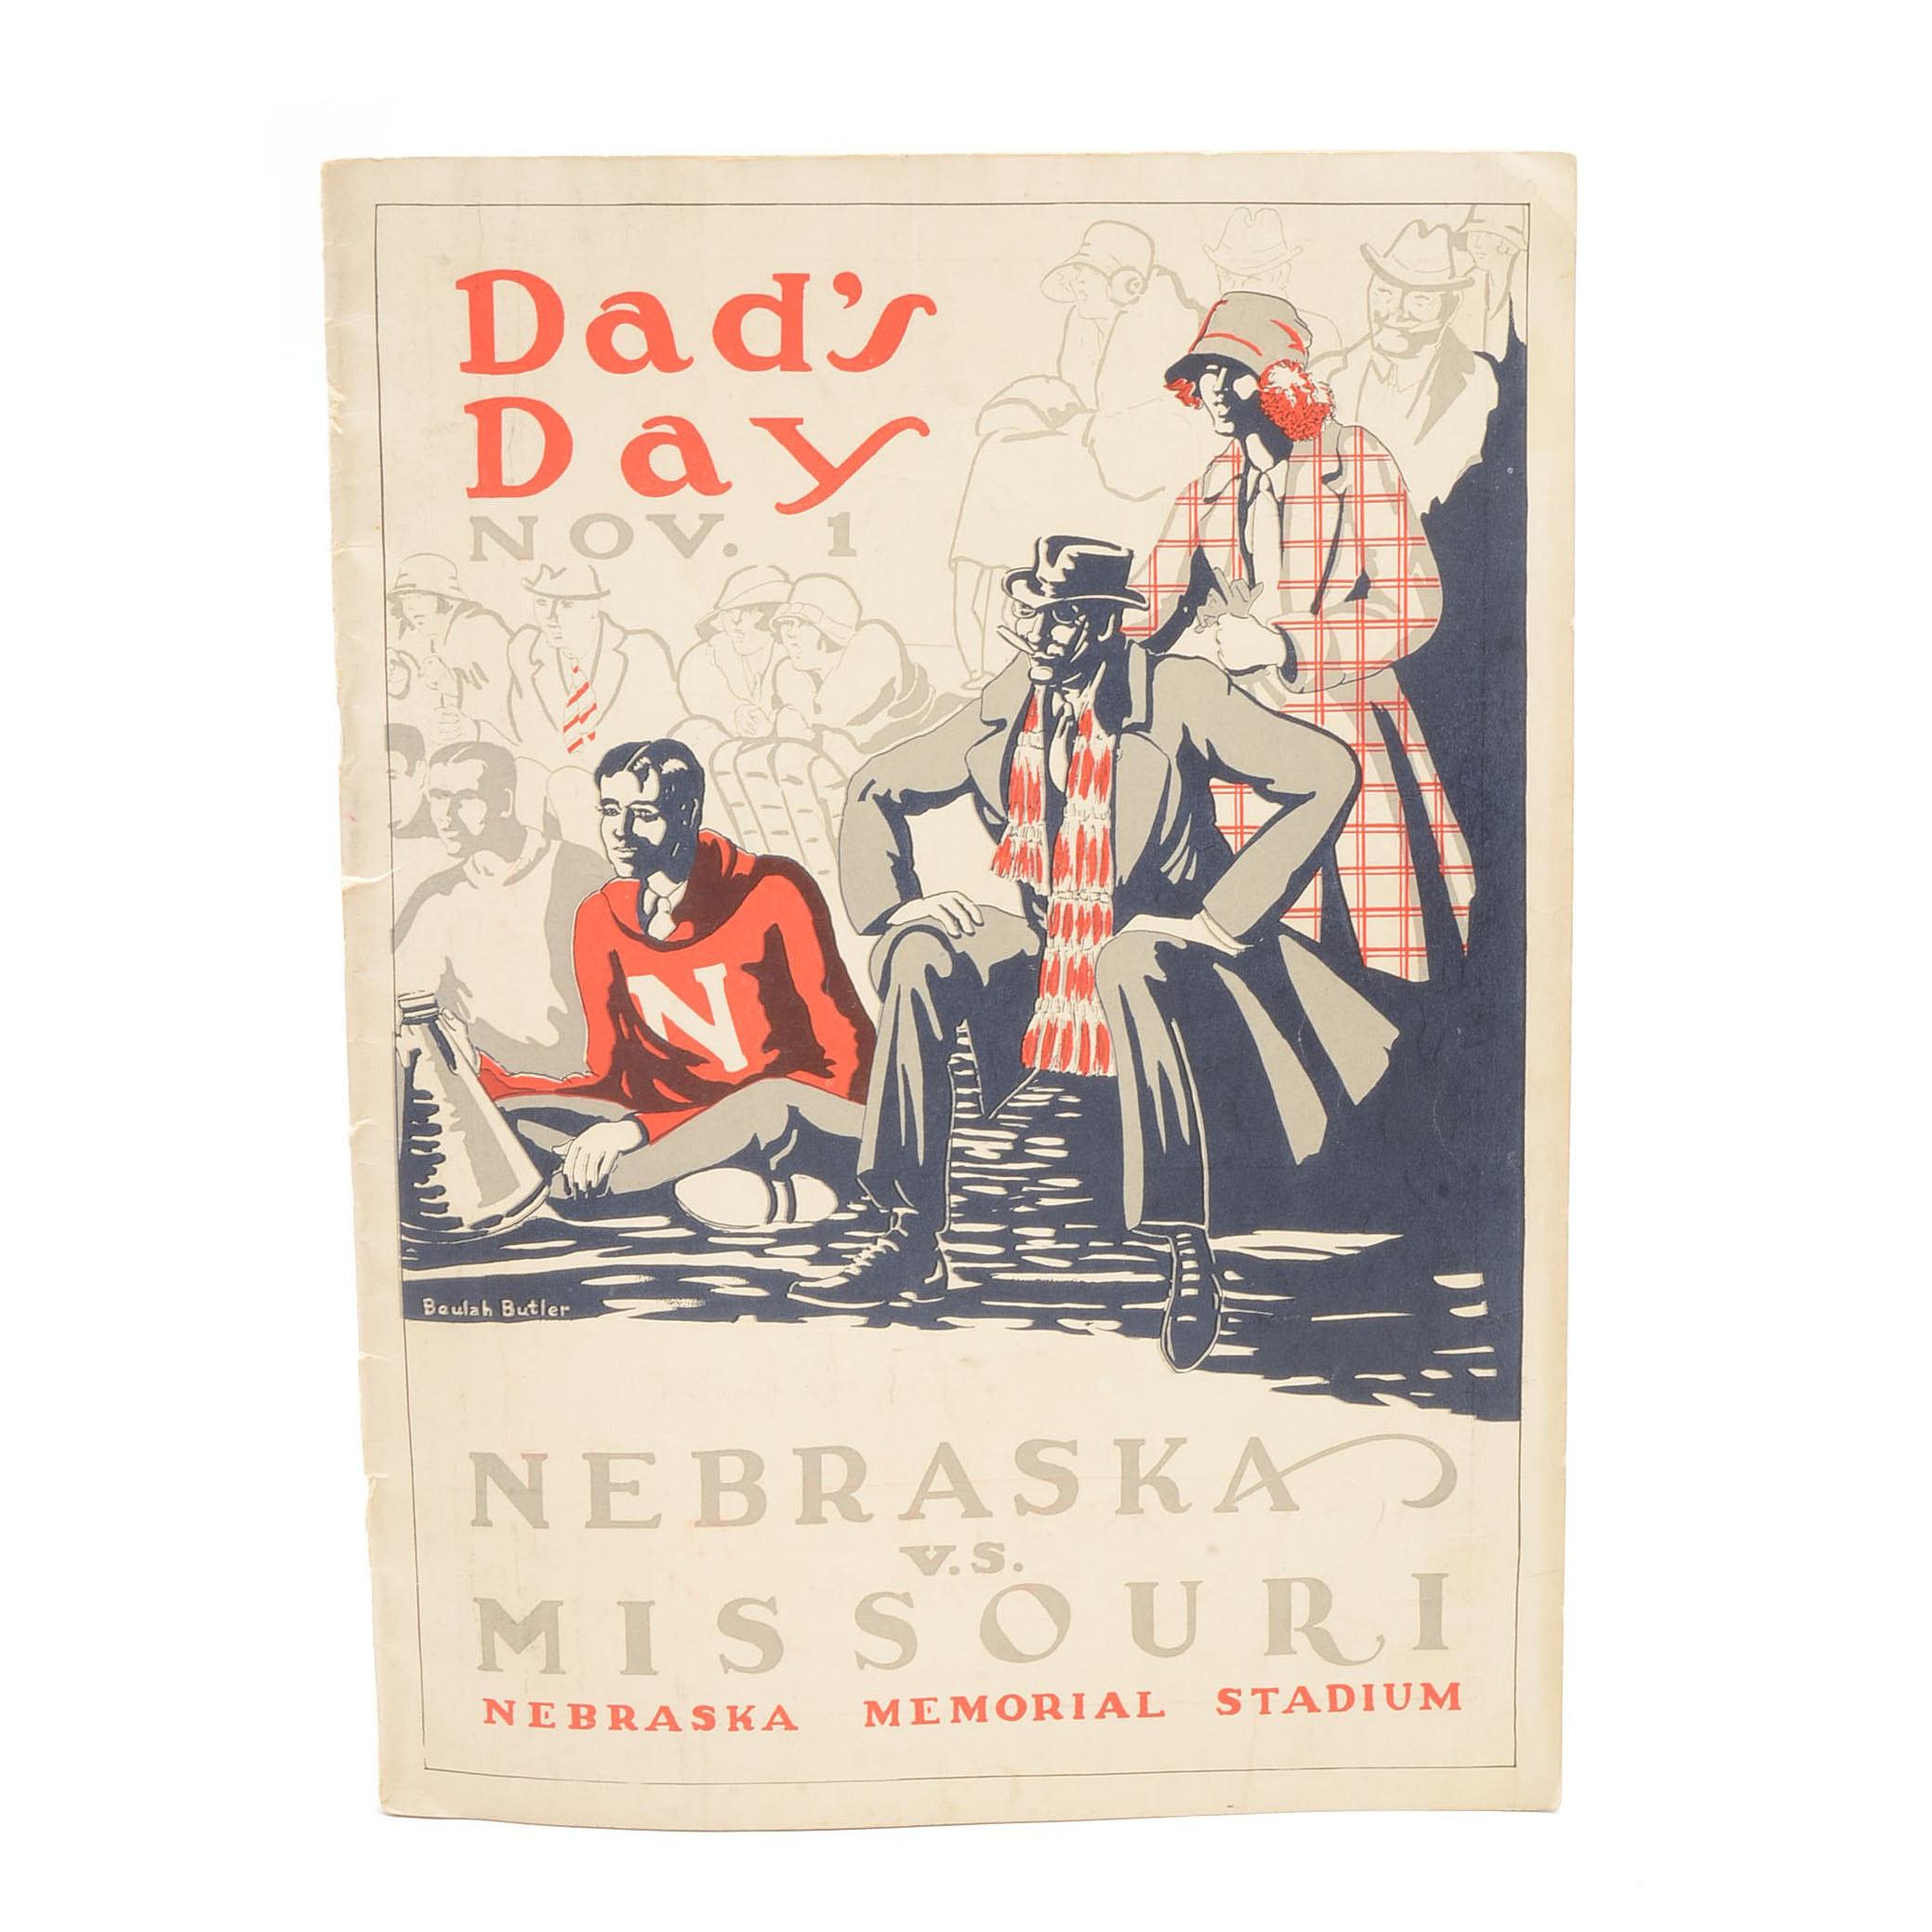 1924 University Of Nebraska Vs. Missouri Football Program